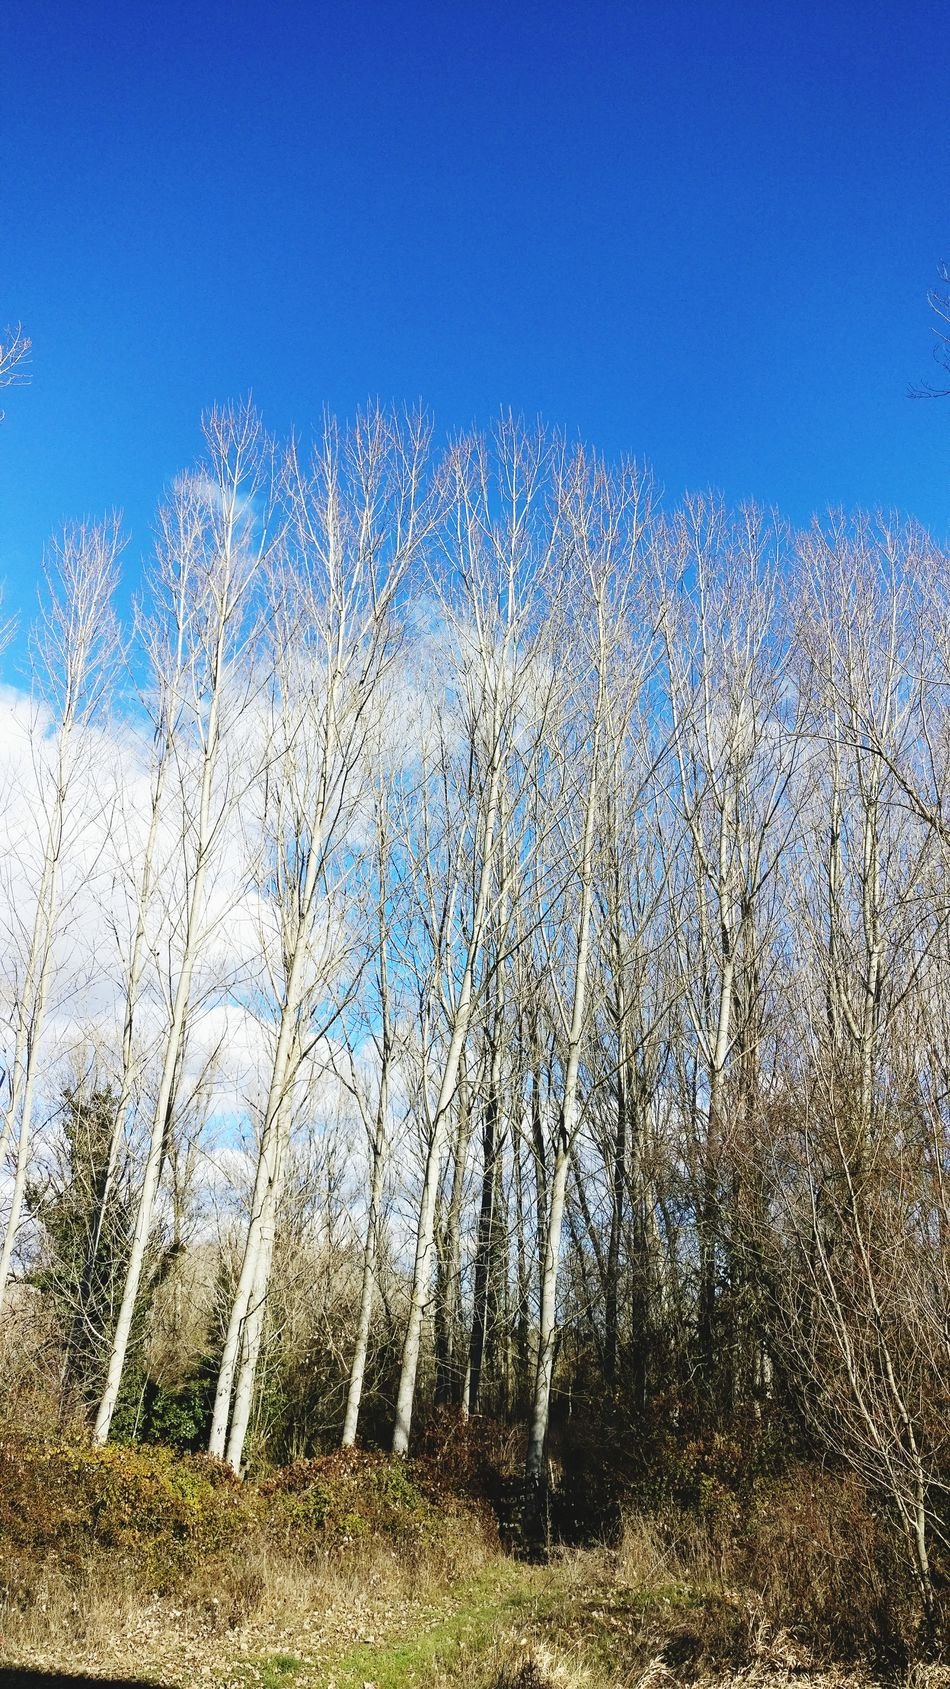 Un pequeño bosque Nature Sky No People Outdoors LeonEsp